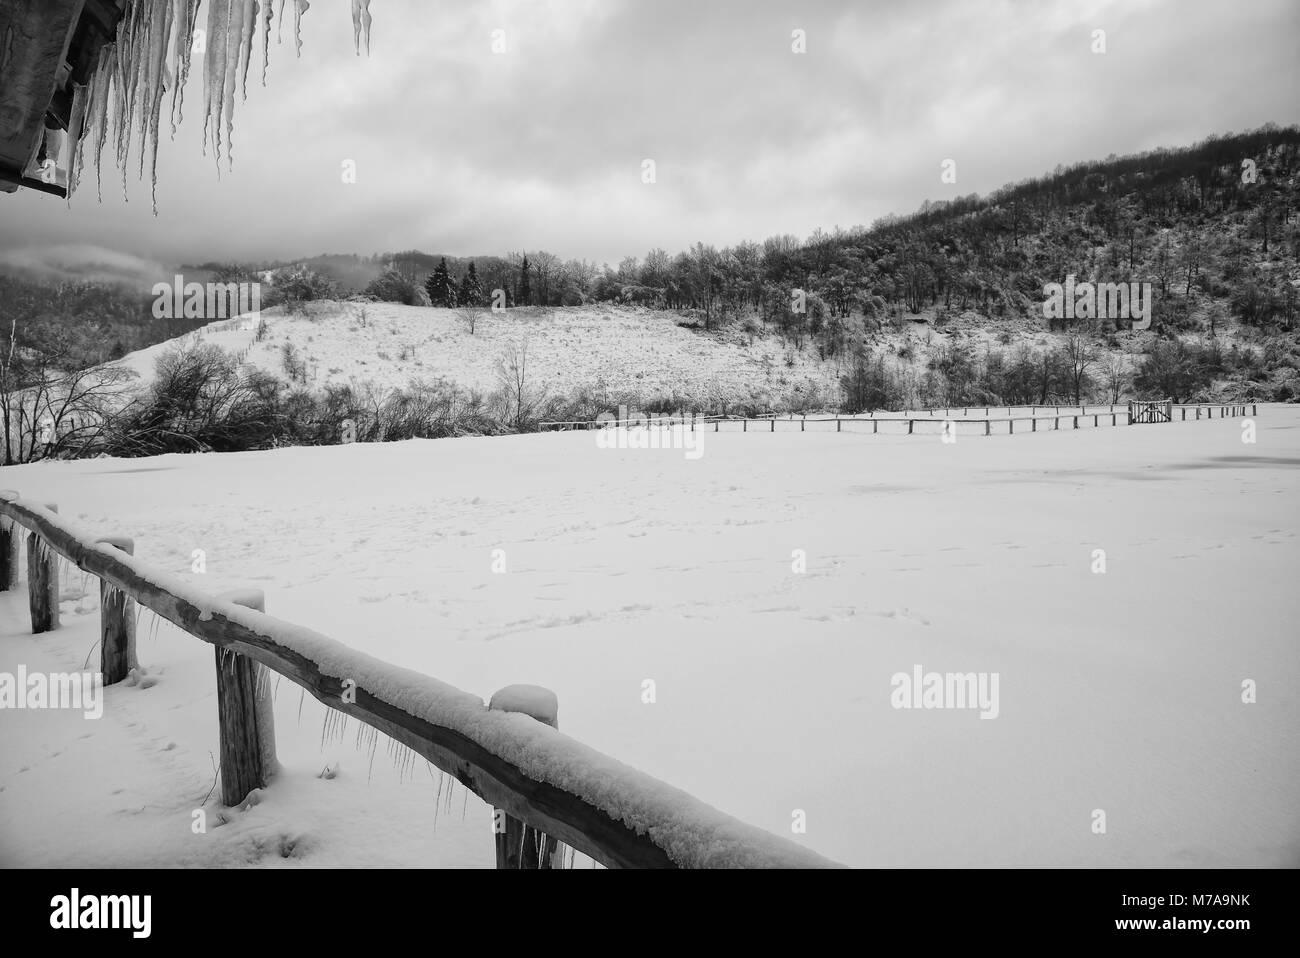 Snow and ice in Santo Stefano d'Aveto - Liguria - Italy Stock Photo